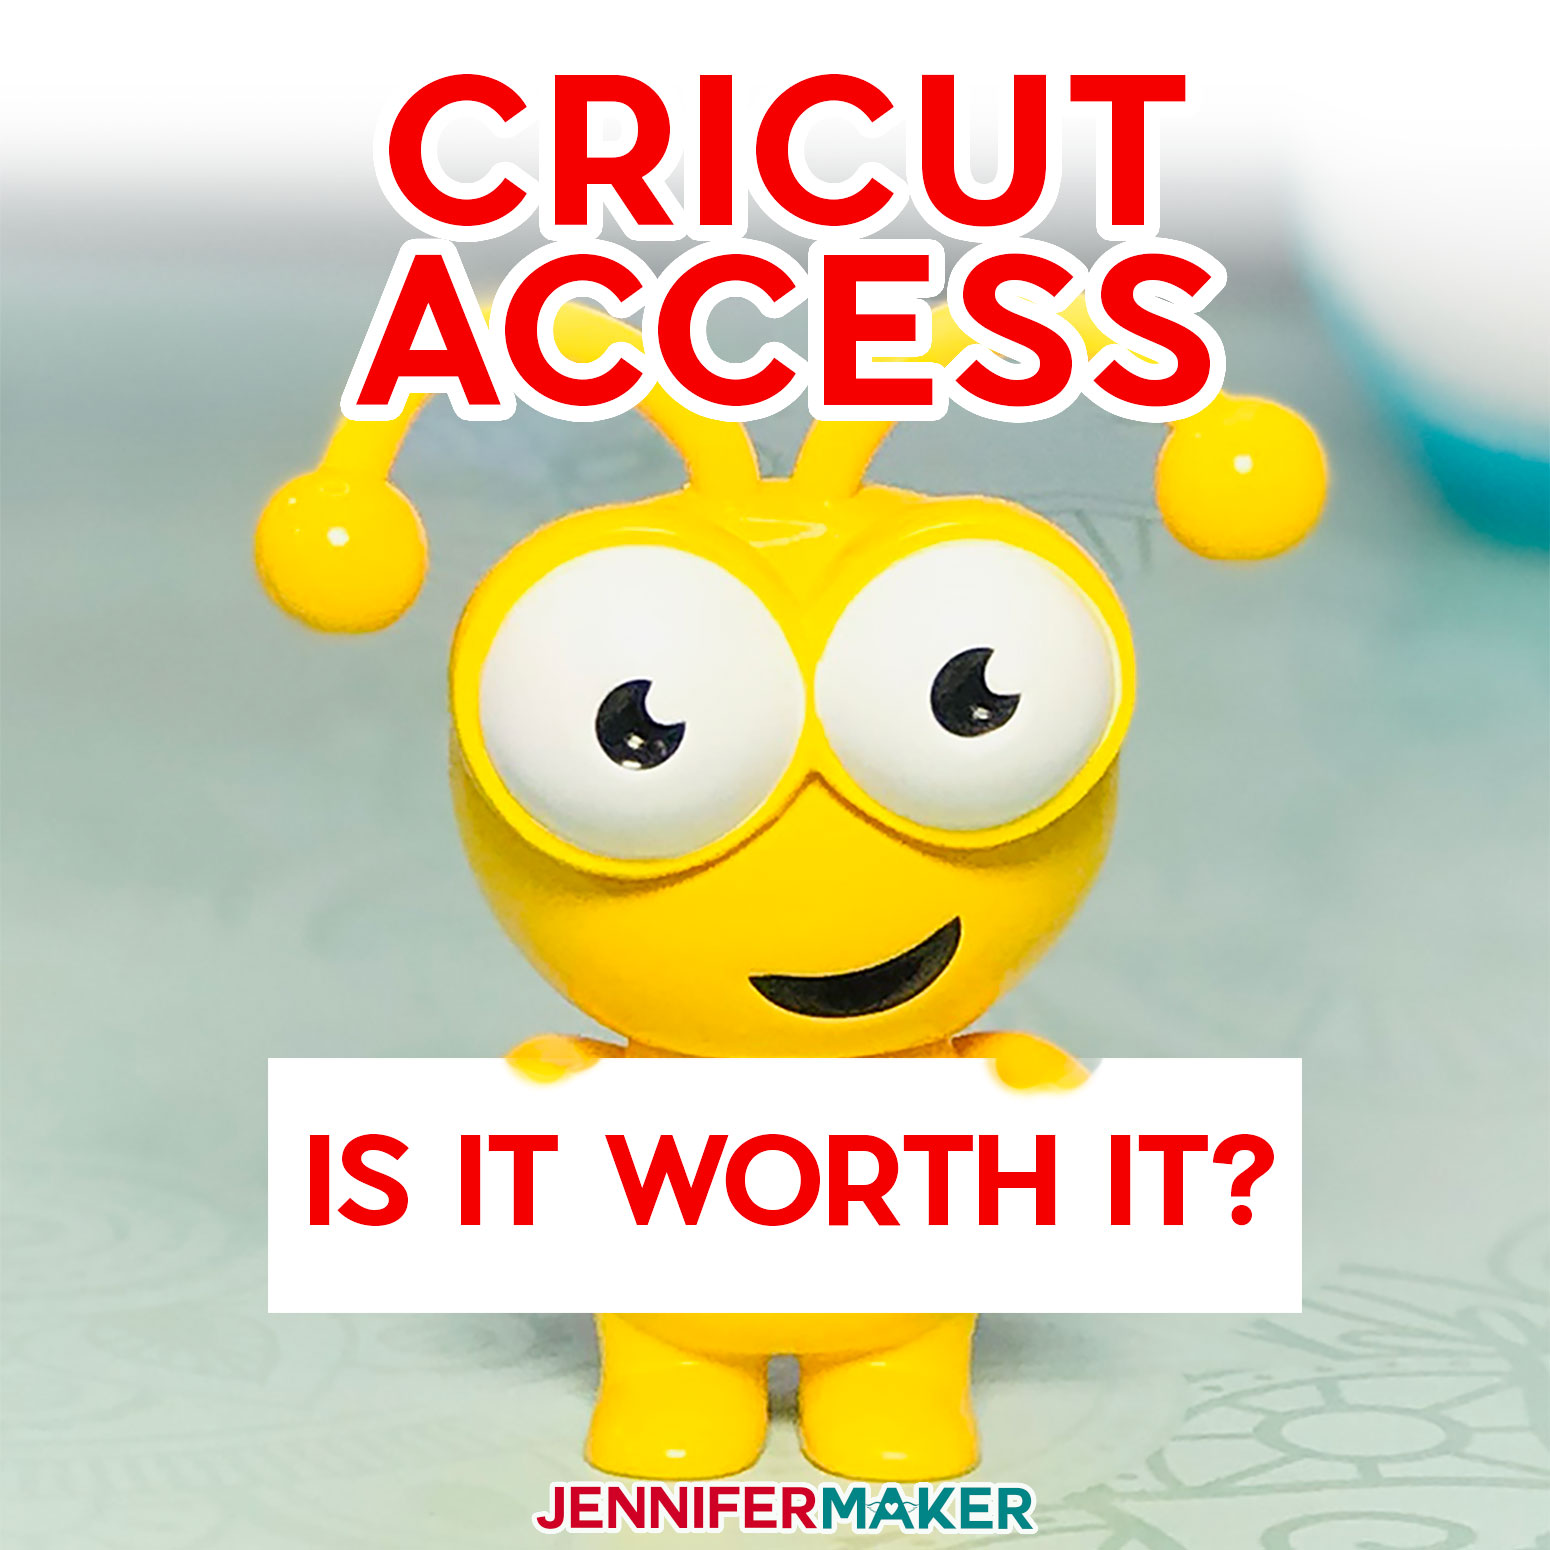 Cricut Access: What is It? Is it Worth It? #cricut #cricutaccess